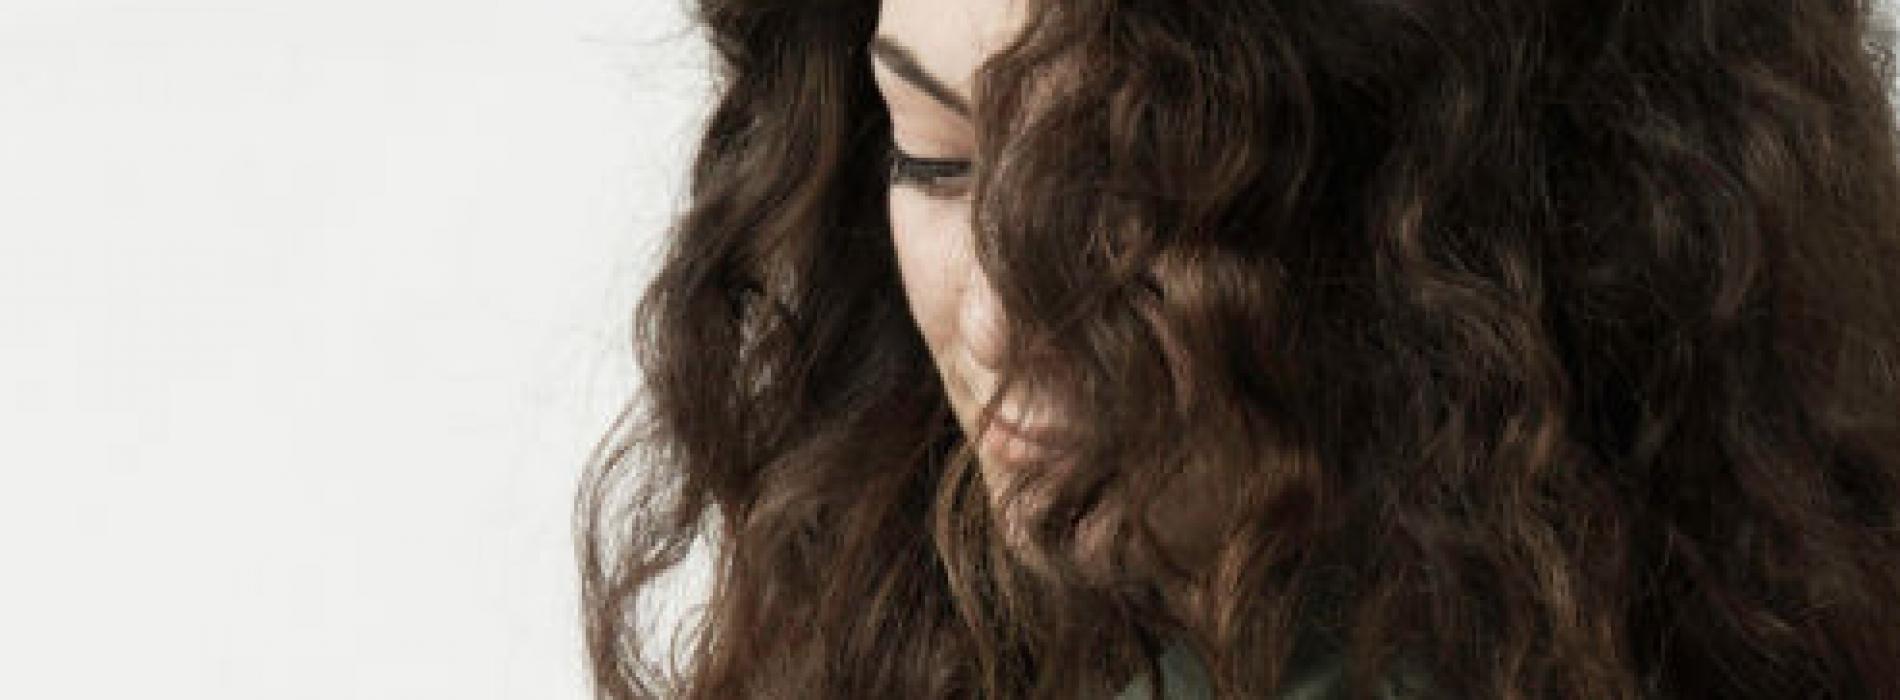 Christian Q & Shokstix: Lorde – Team (remix)